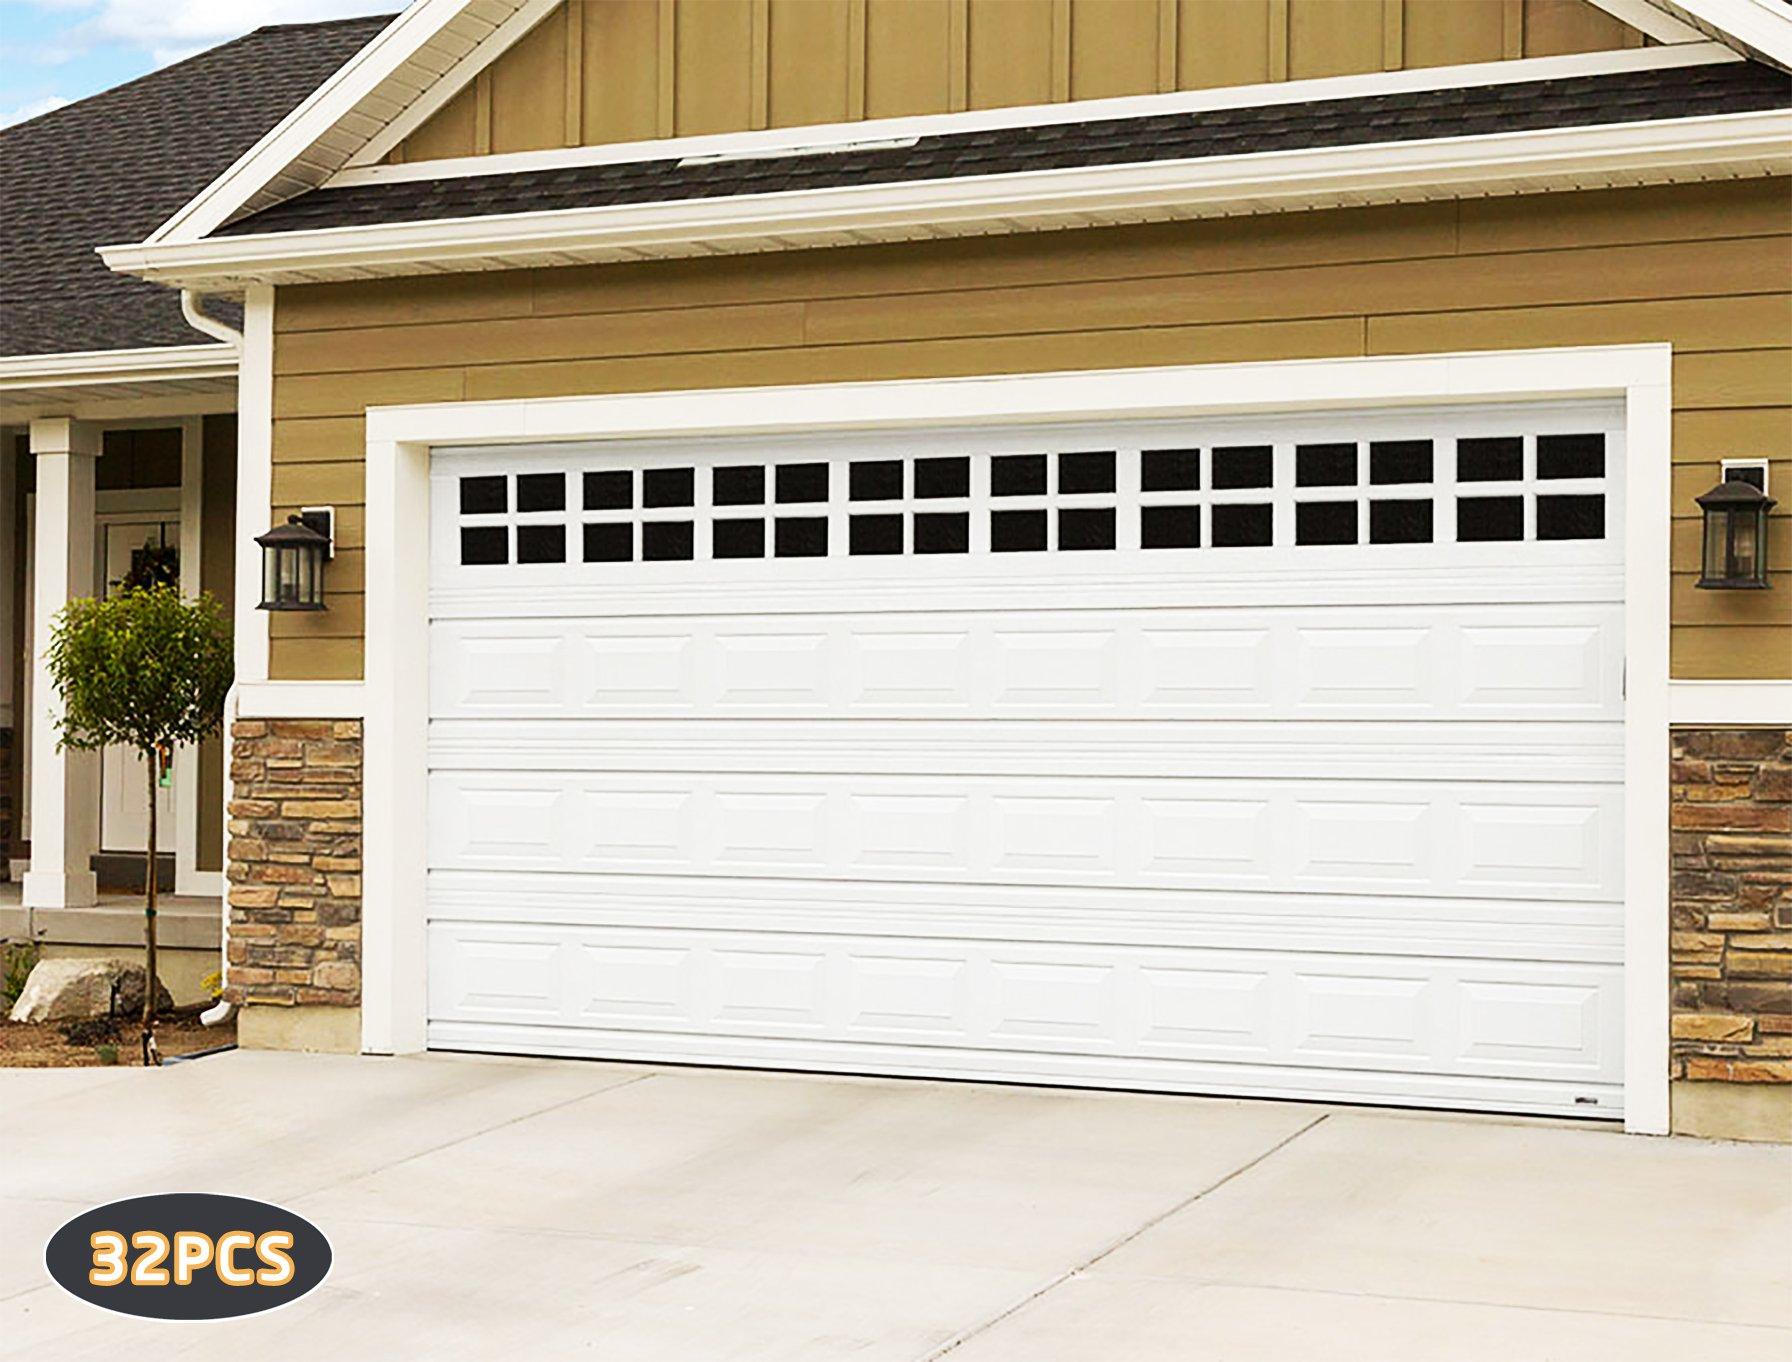 Details About Any Beauty 32 Pack Magnetic Garage Door Faux Windows(5 3/4u201d X  3 3/4), Black,